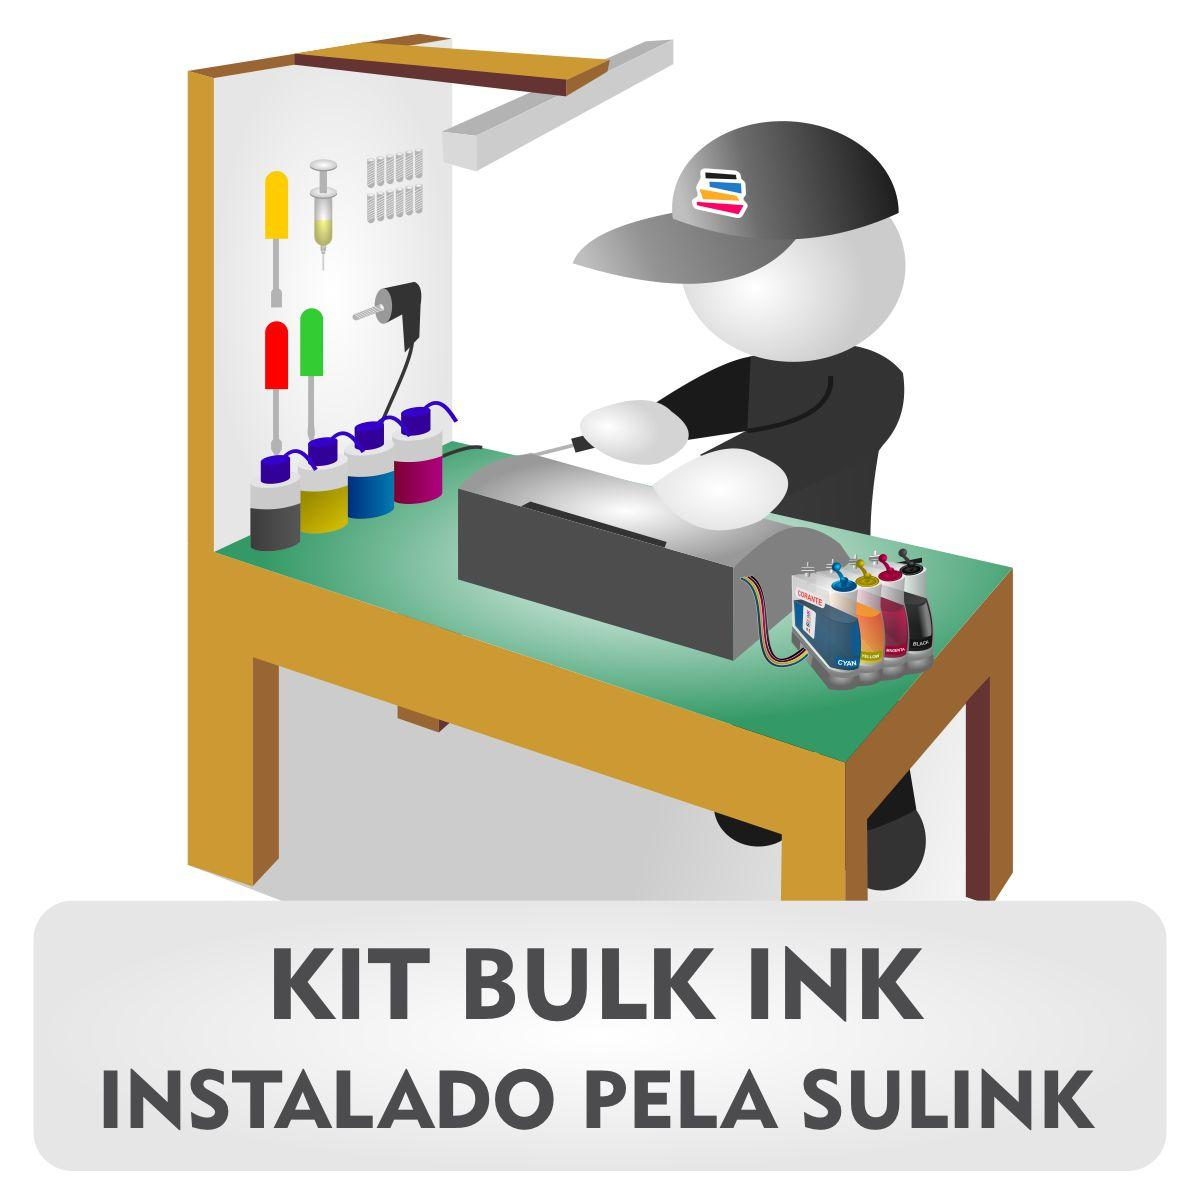 INSTALADO - Bulk Ink para HP OfficeJet 7510 Multifuncional A3 - 250ml 4 Cores Corante HP Serie Pro | Instalado pela Sulink (Sem Cartucho - Utilizar Original HP do Cliente)